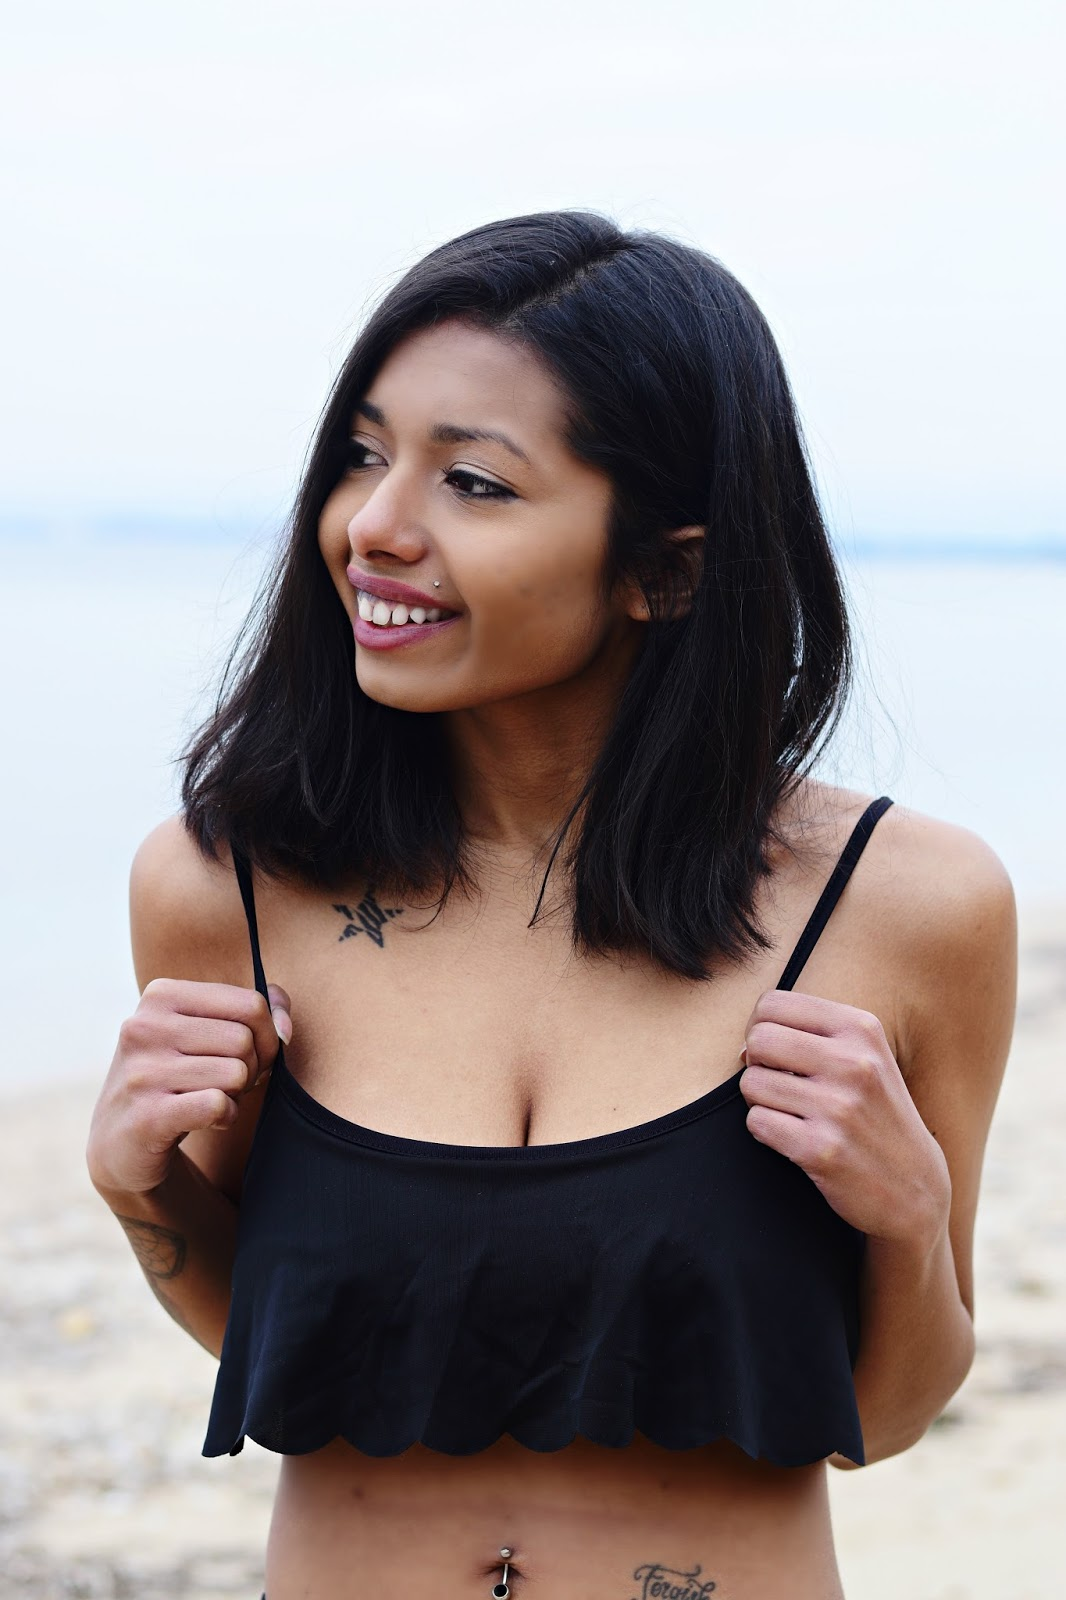 k-meets-style black bikini photoshoot